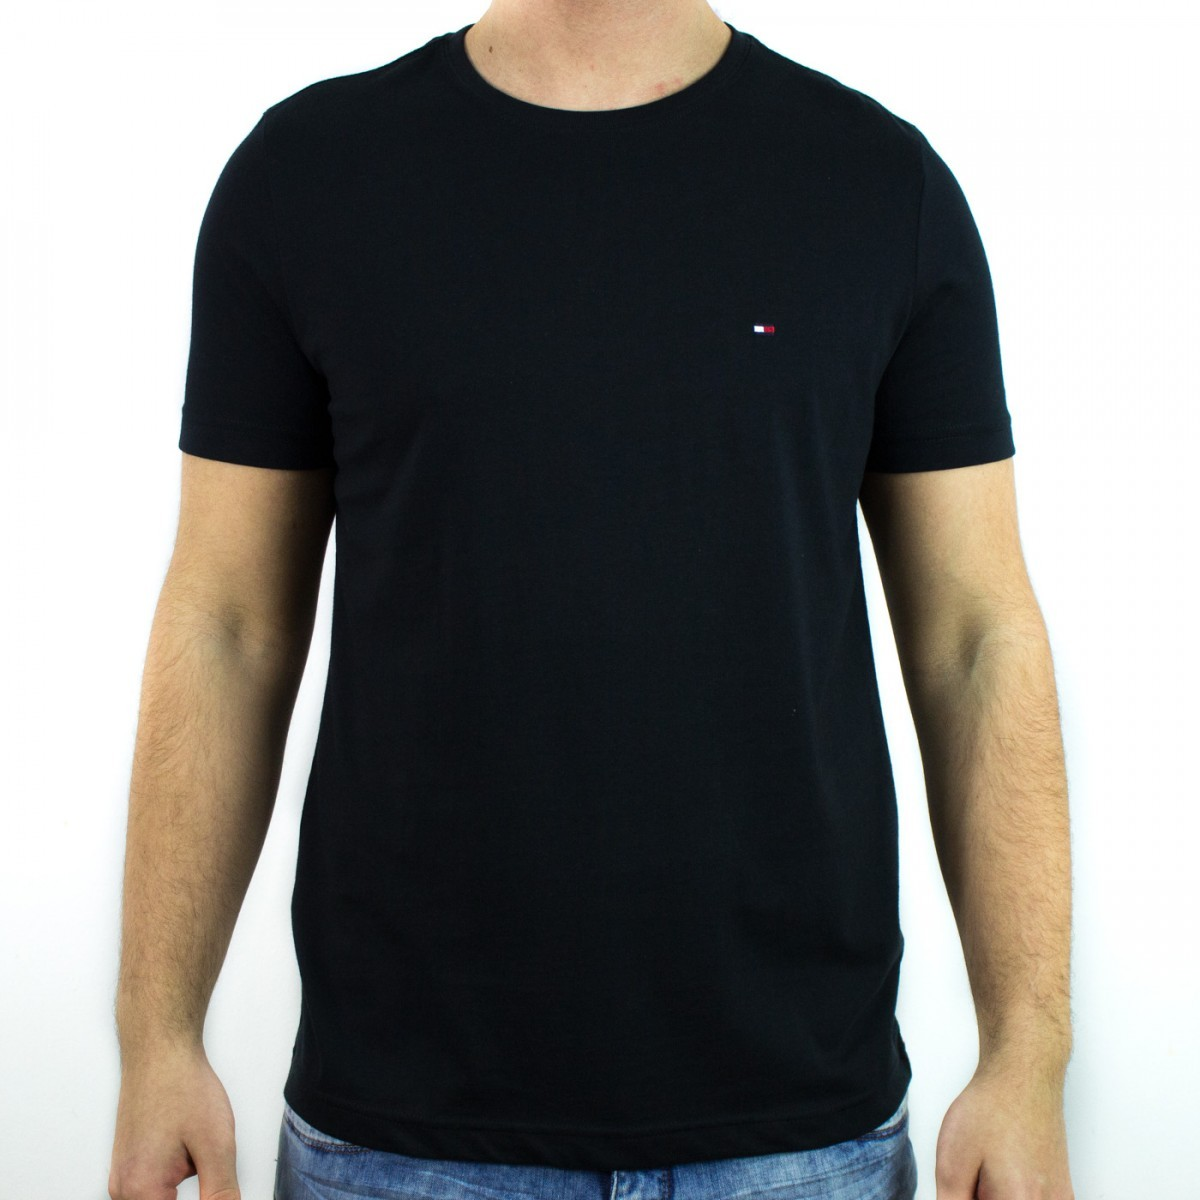 1fc89d53261be3 Bizz Store - Camiseta Masculina Tommy Hilfiger Manga Curta